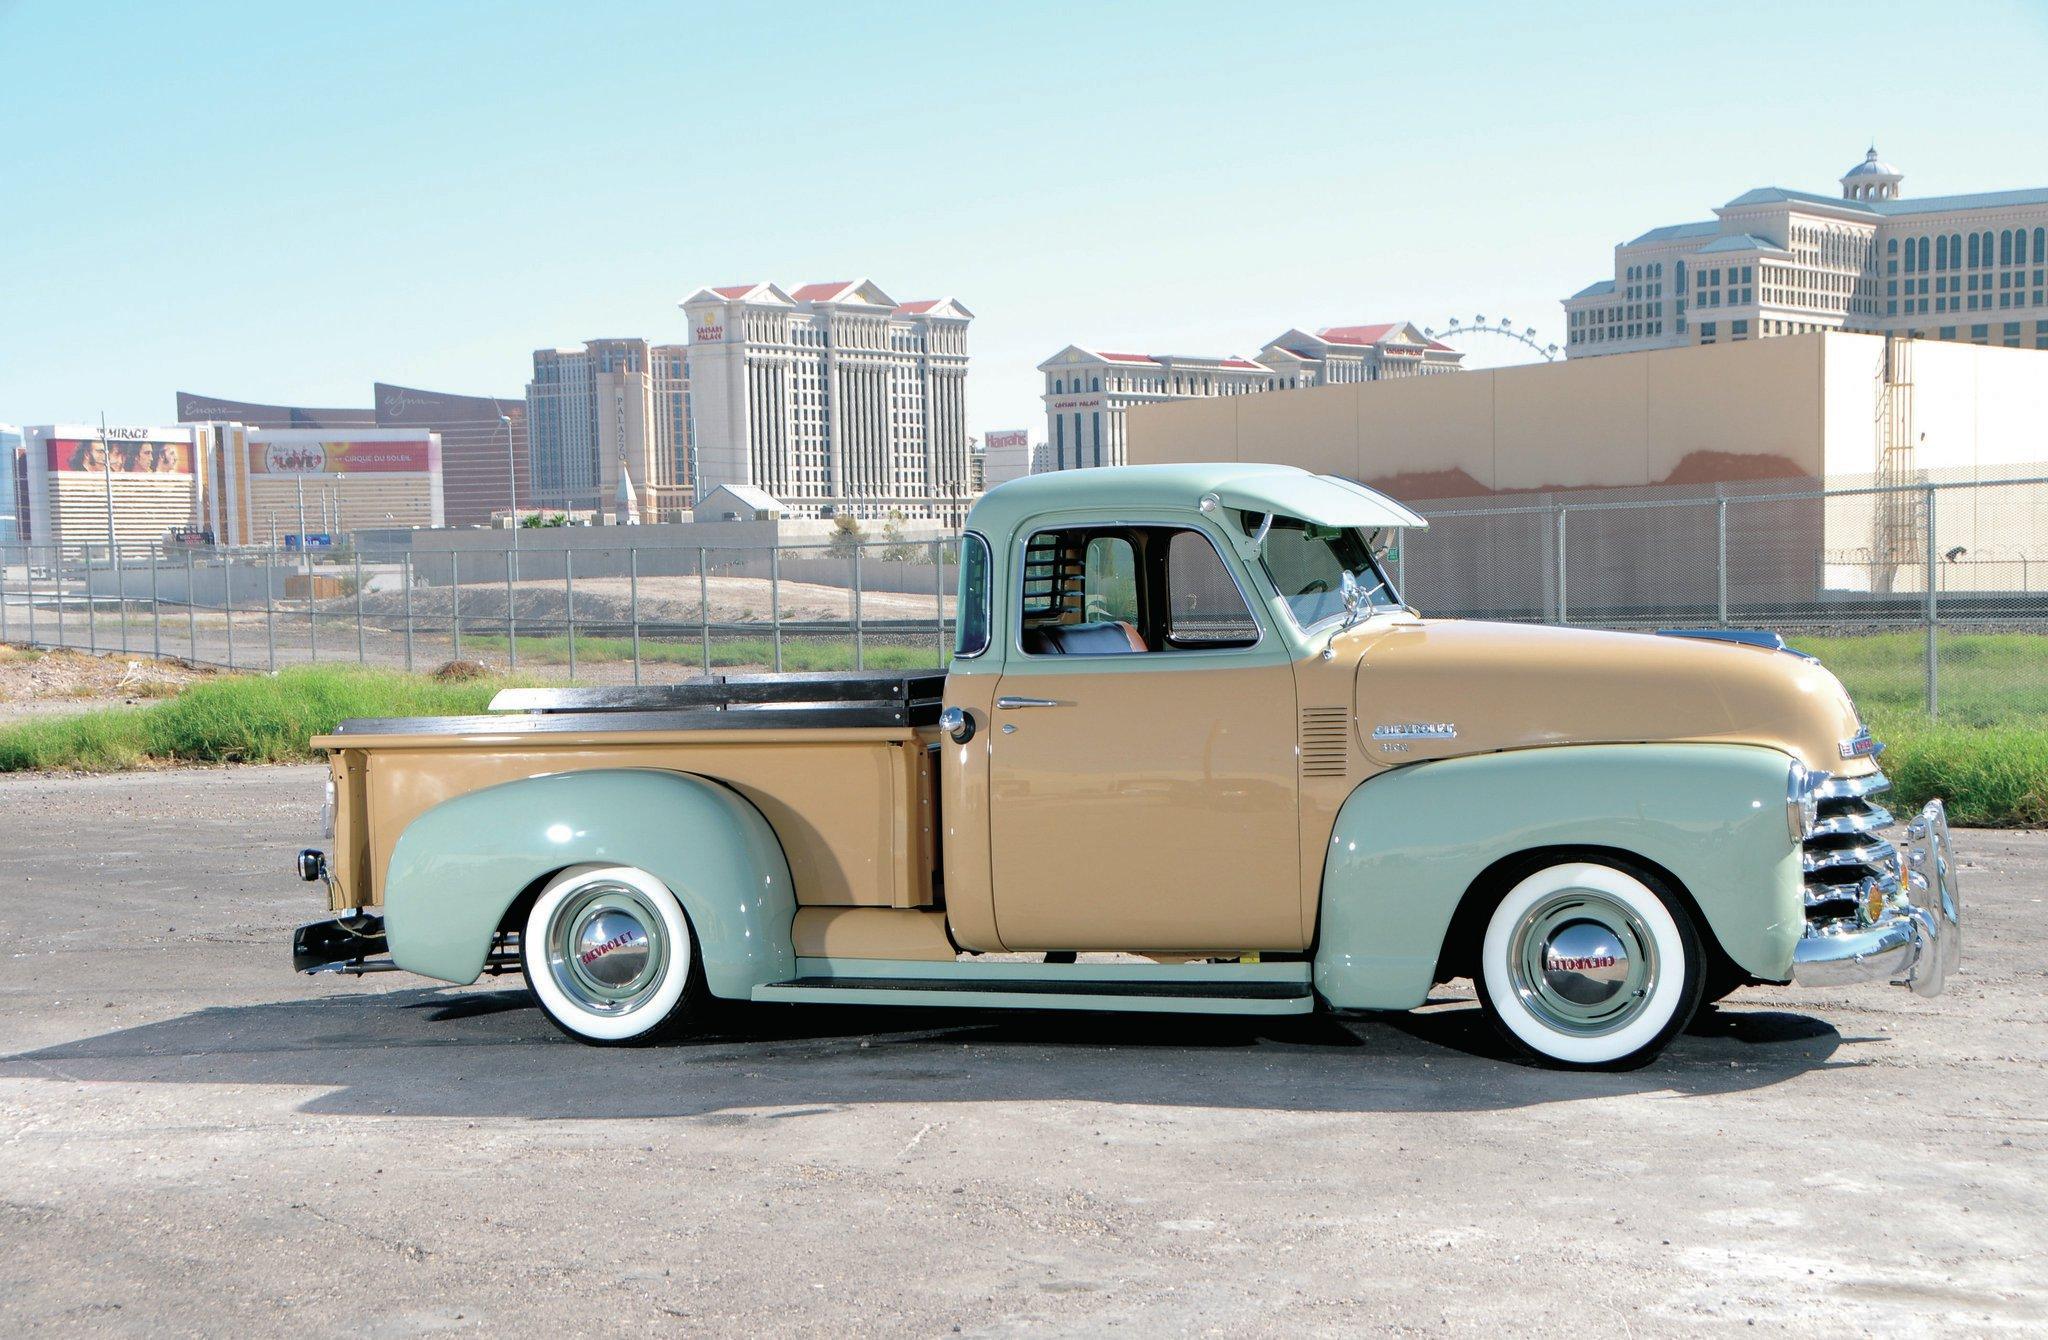 1950 Chevrolet 3100 - 3100 Times